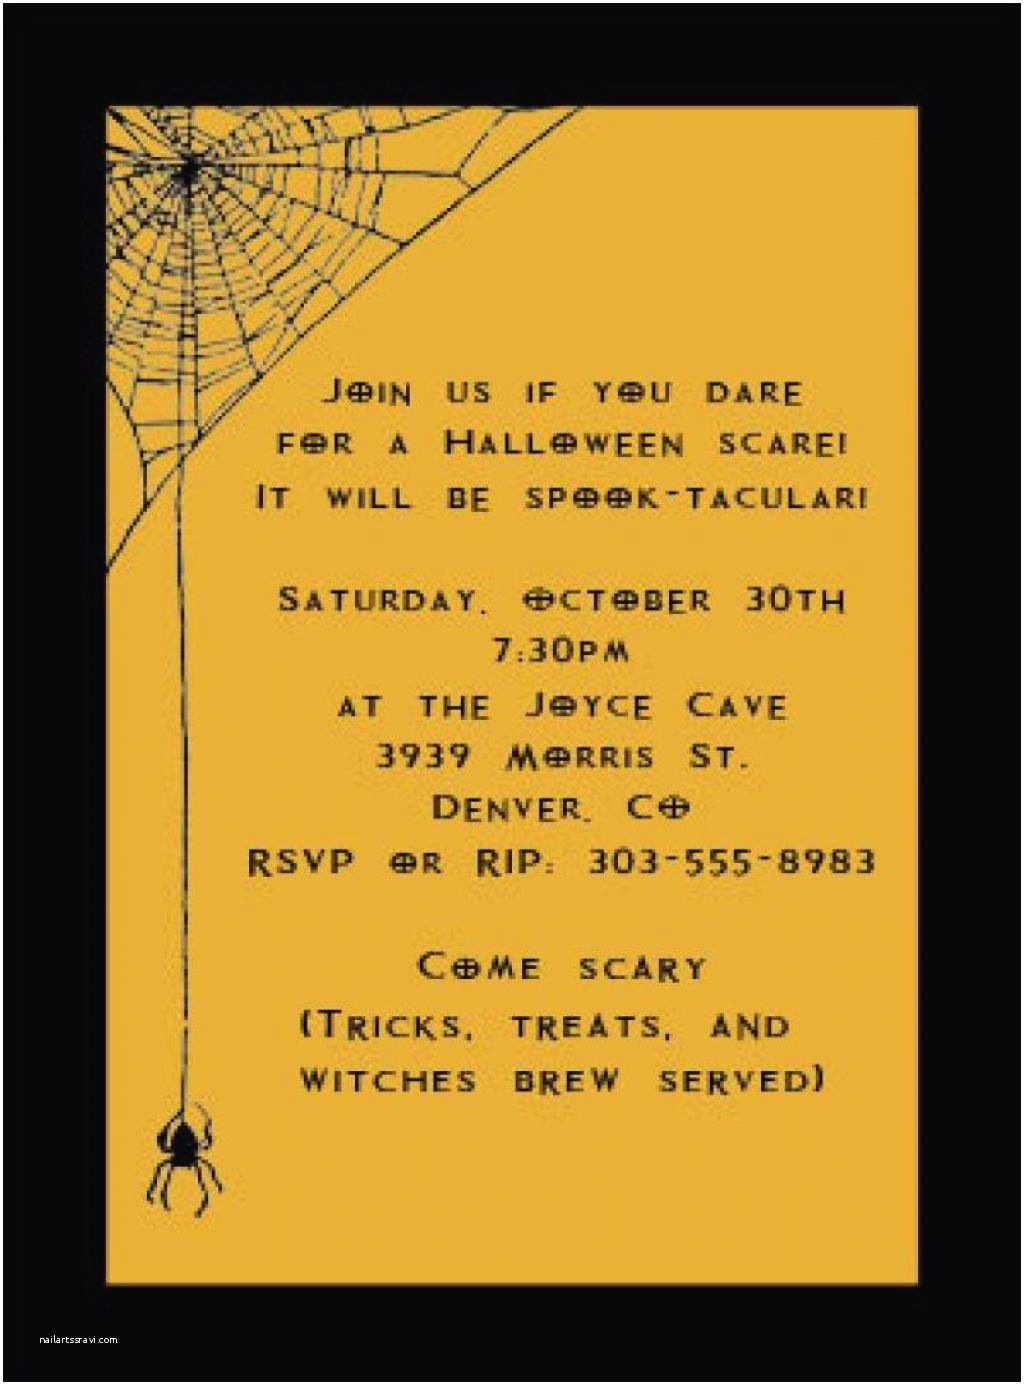 Halloween Party Invite Wording Halloween Party Invitation Wording – Gangcraft